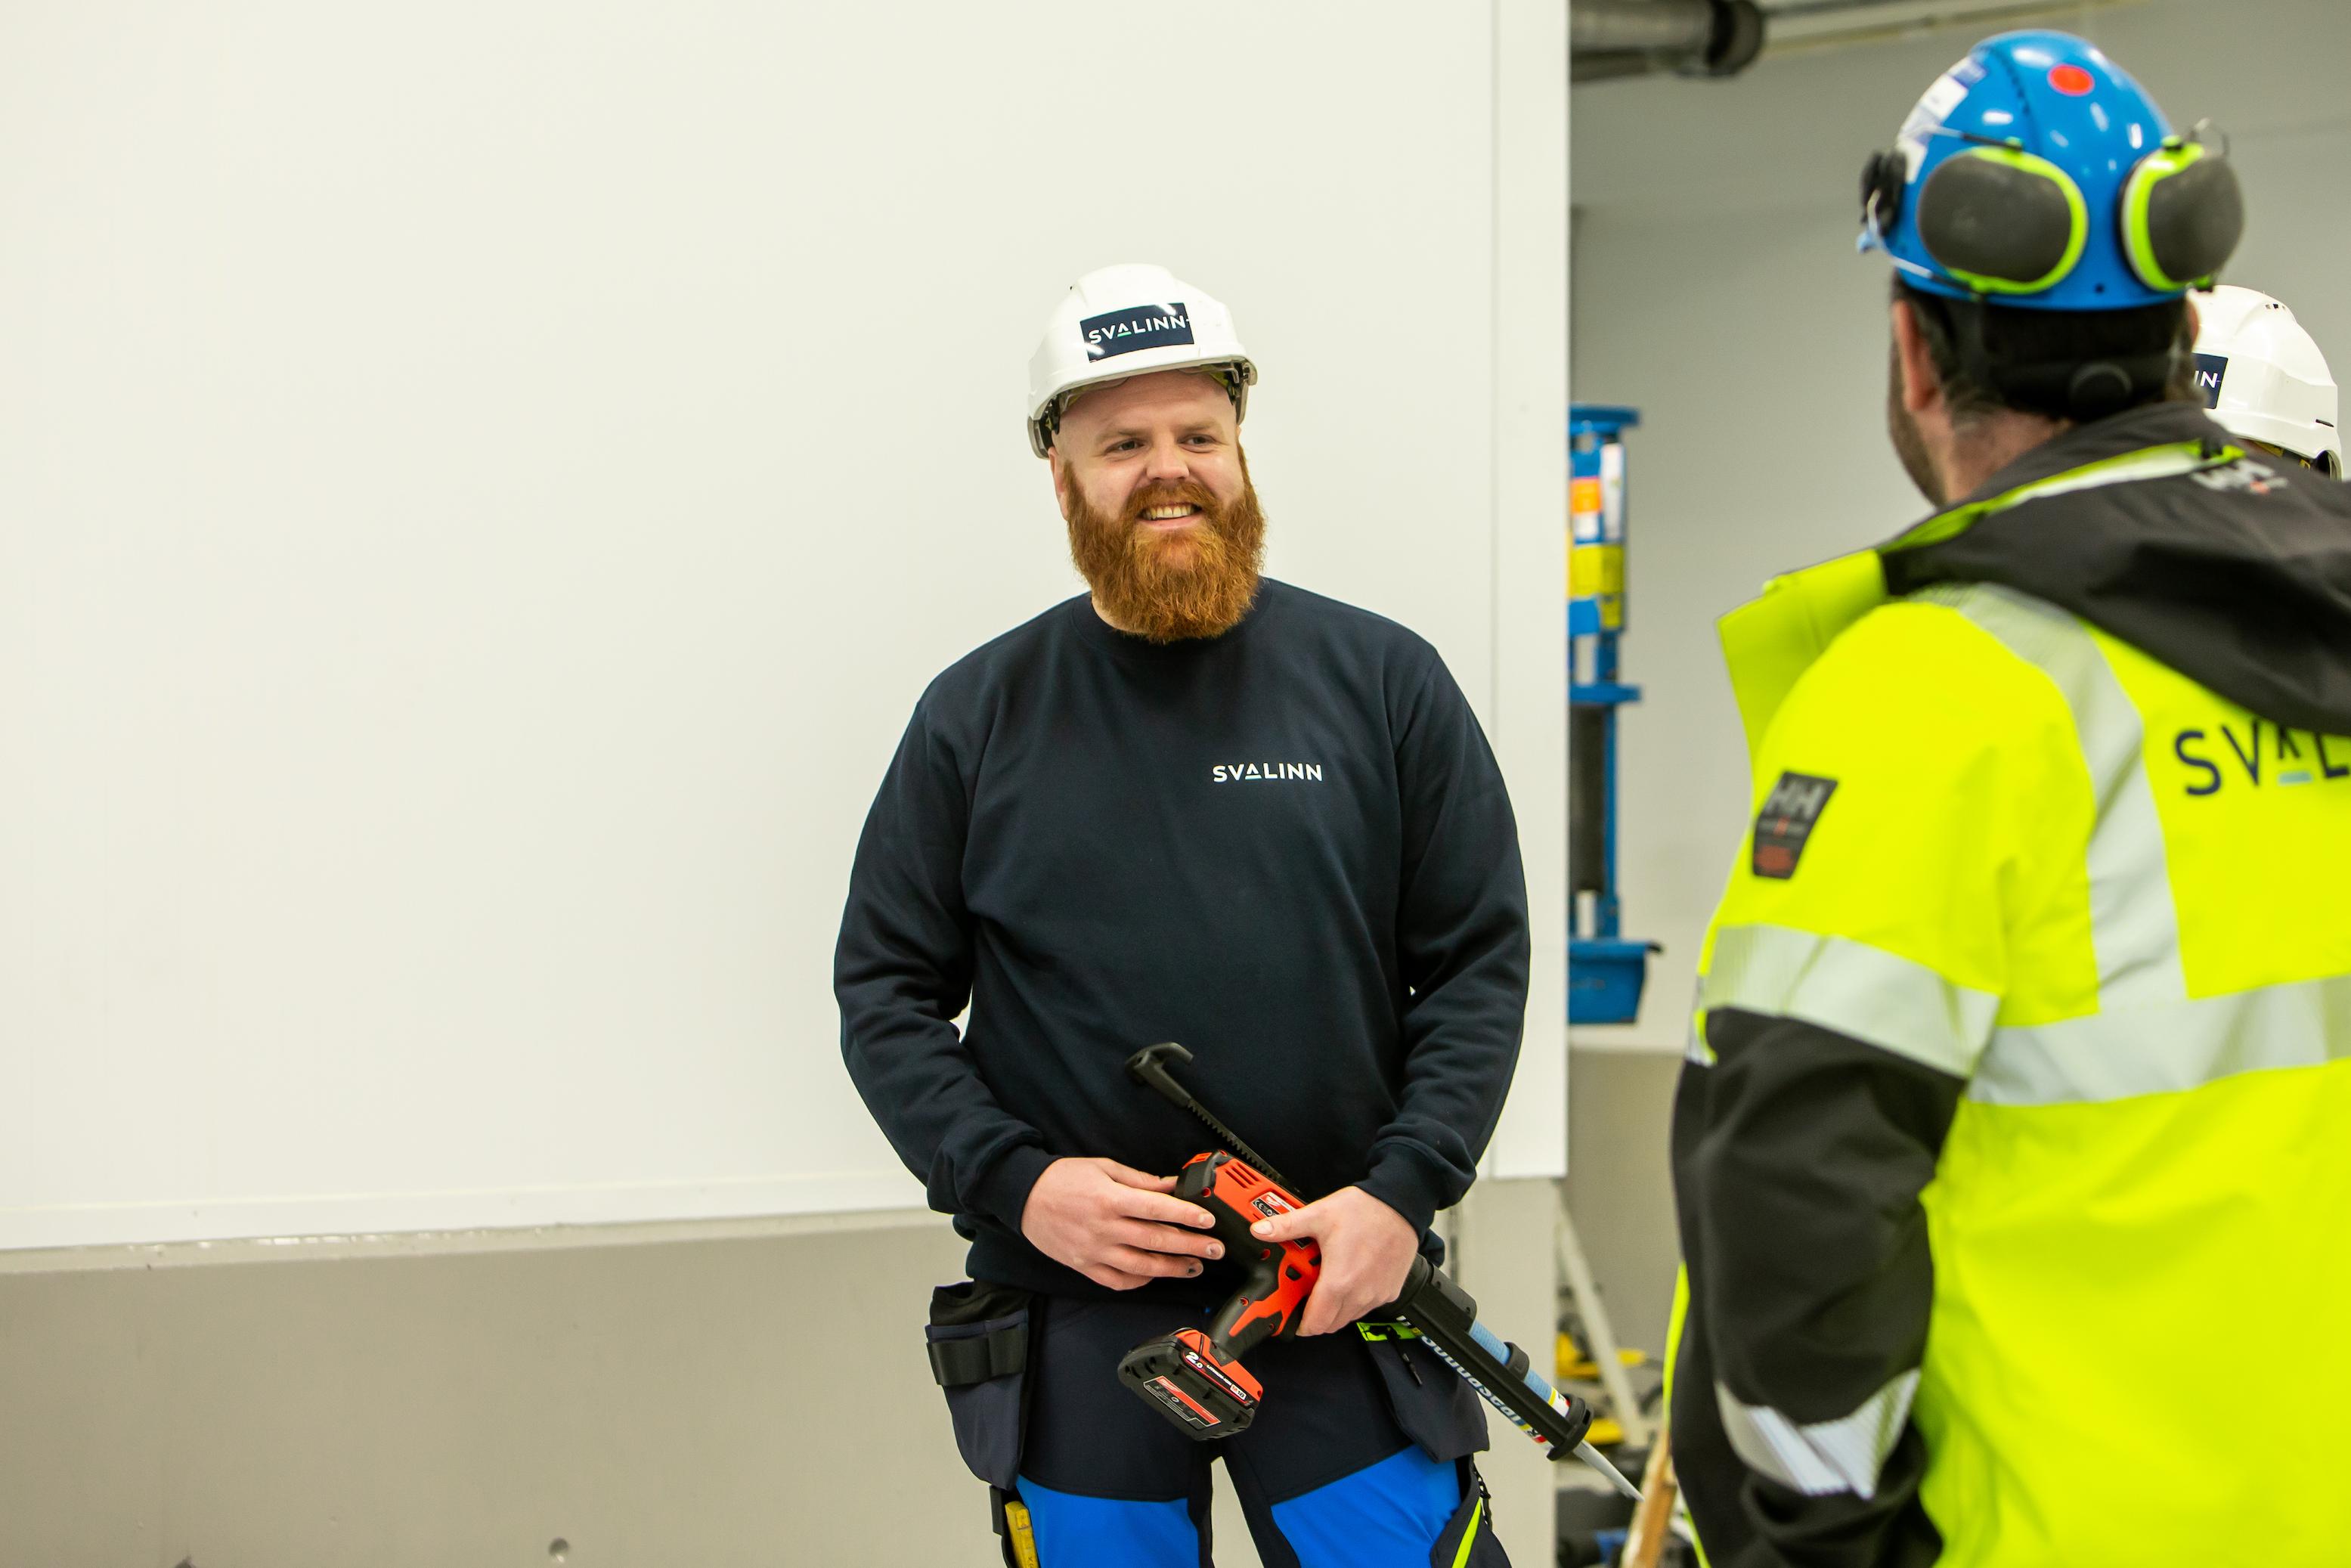 Smilende montør på bygeplass med hard hjelm i montørbekledning.